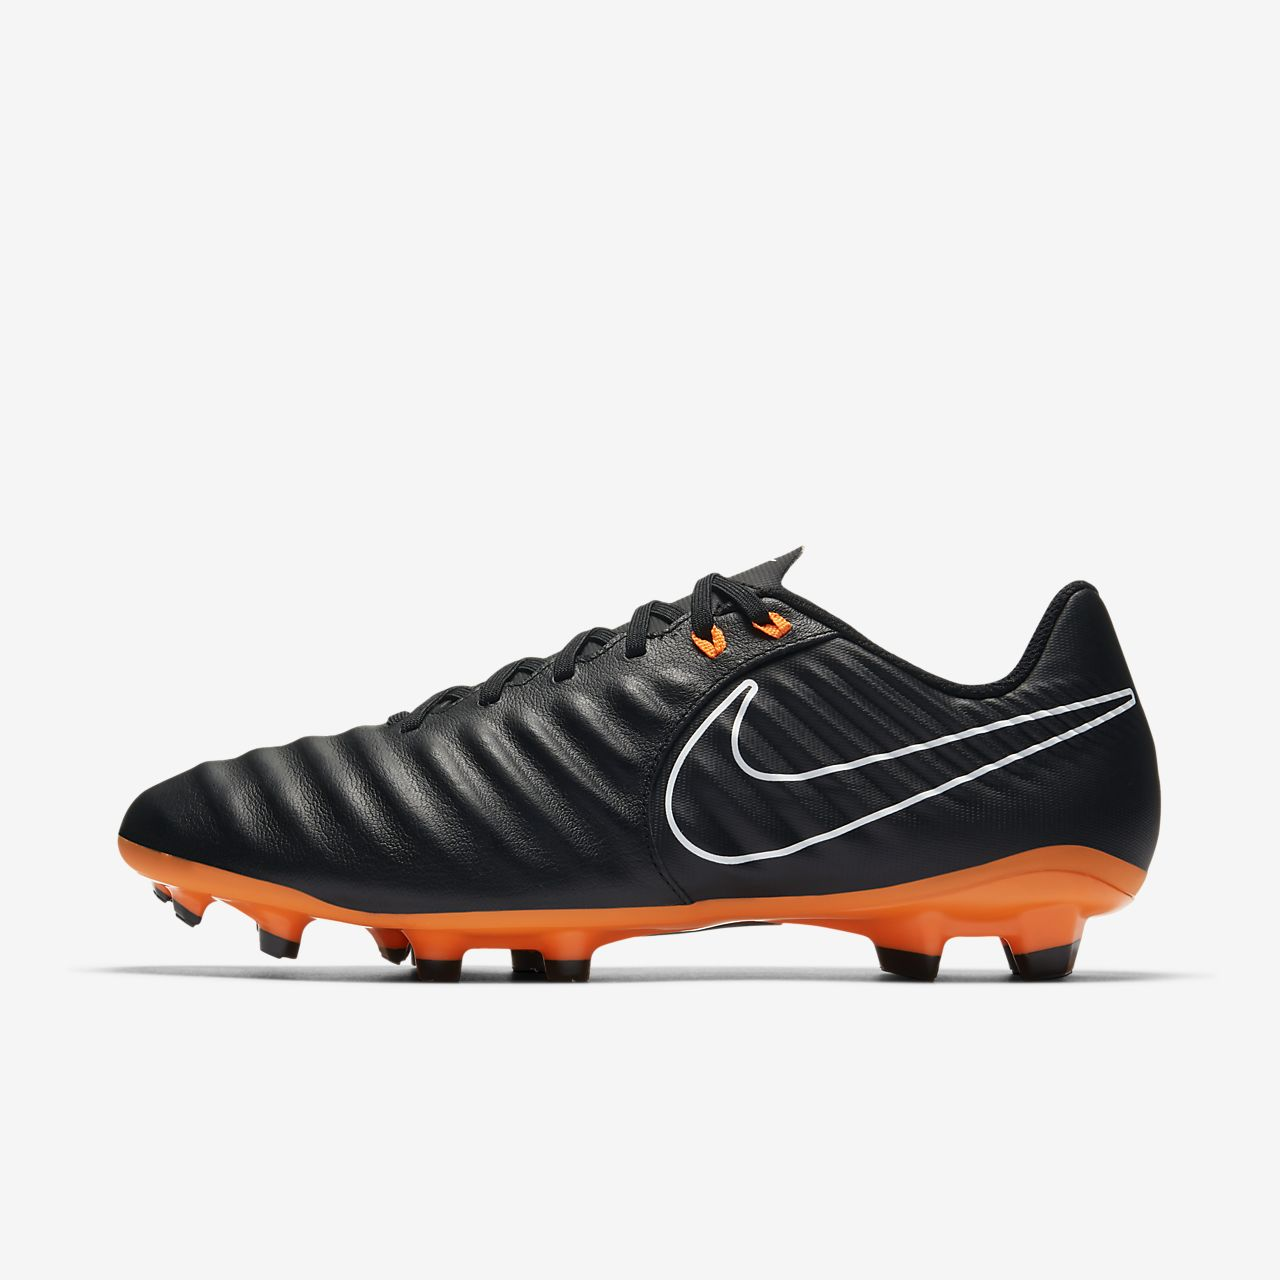 Legend 7 Club (FG) Football Boots - Black/Orange OGhemCj97